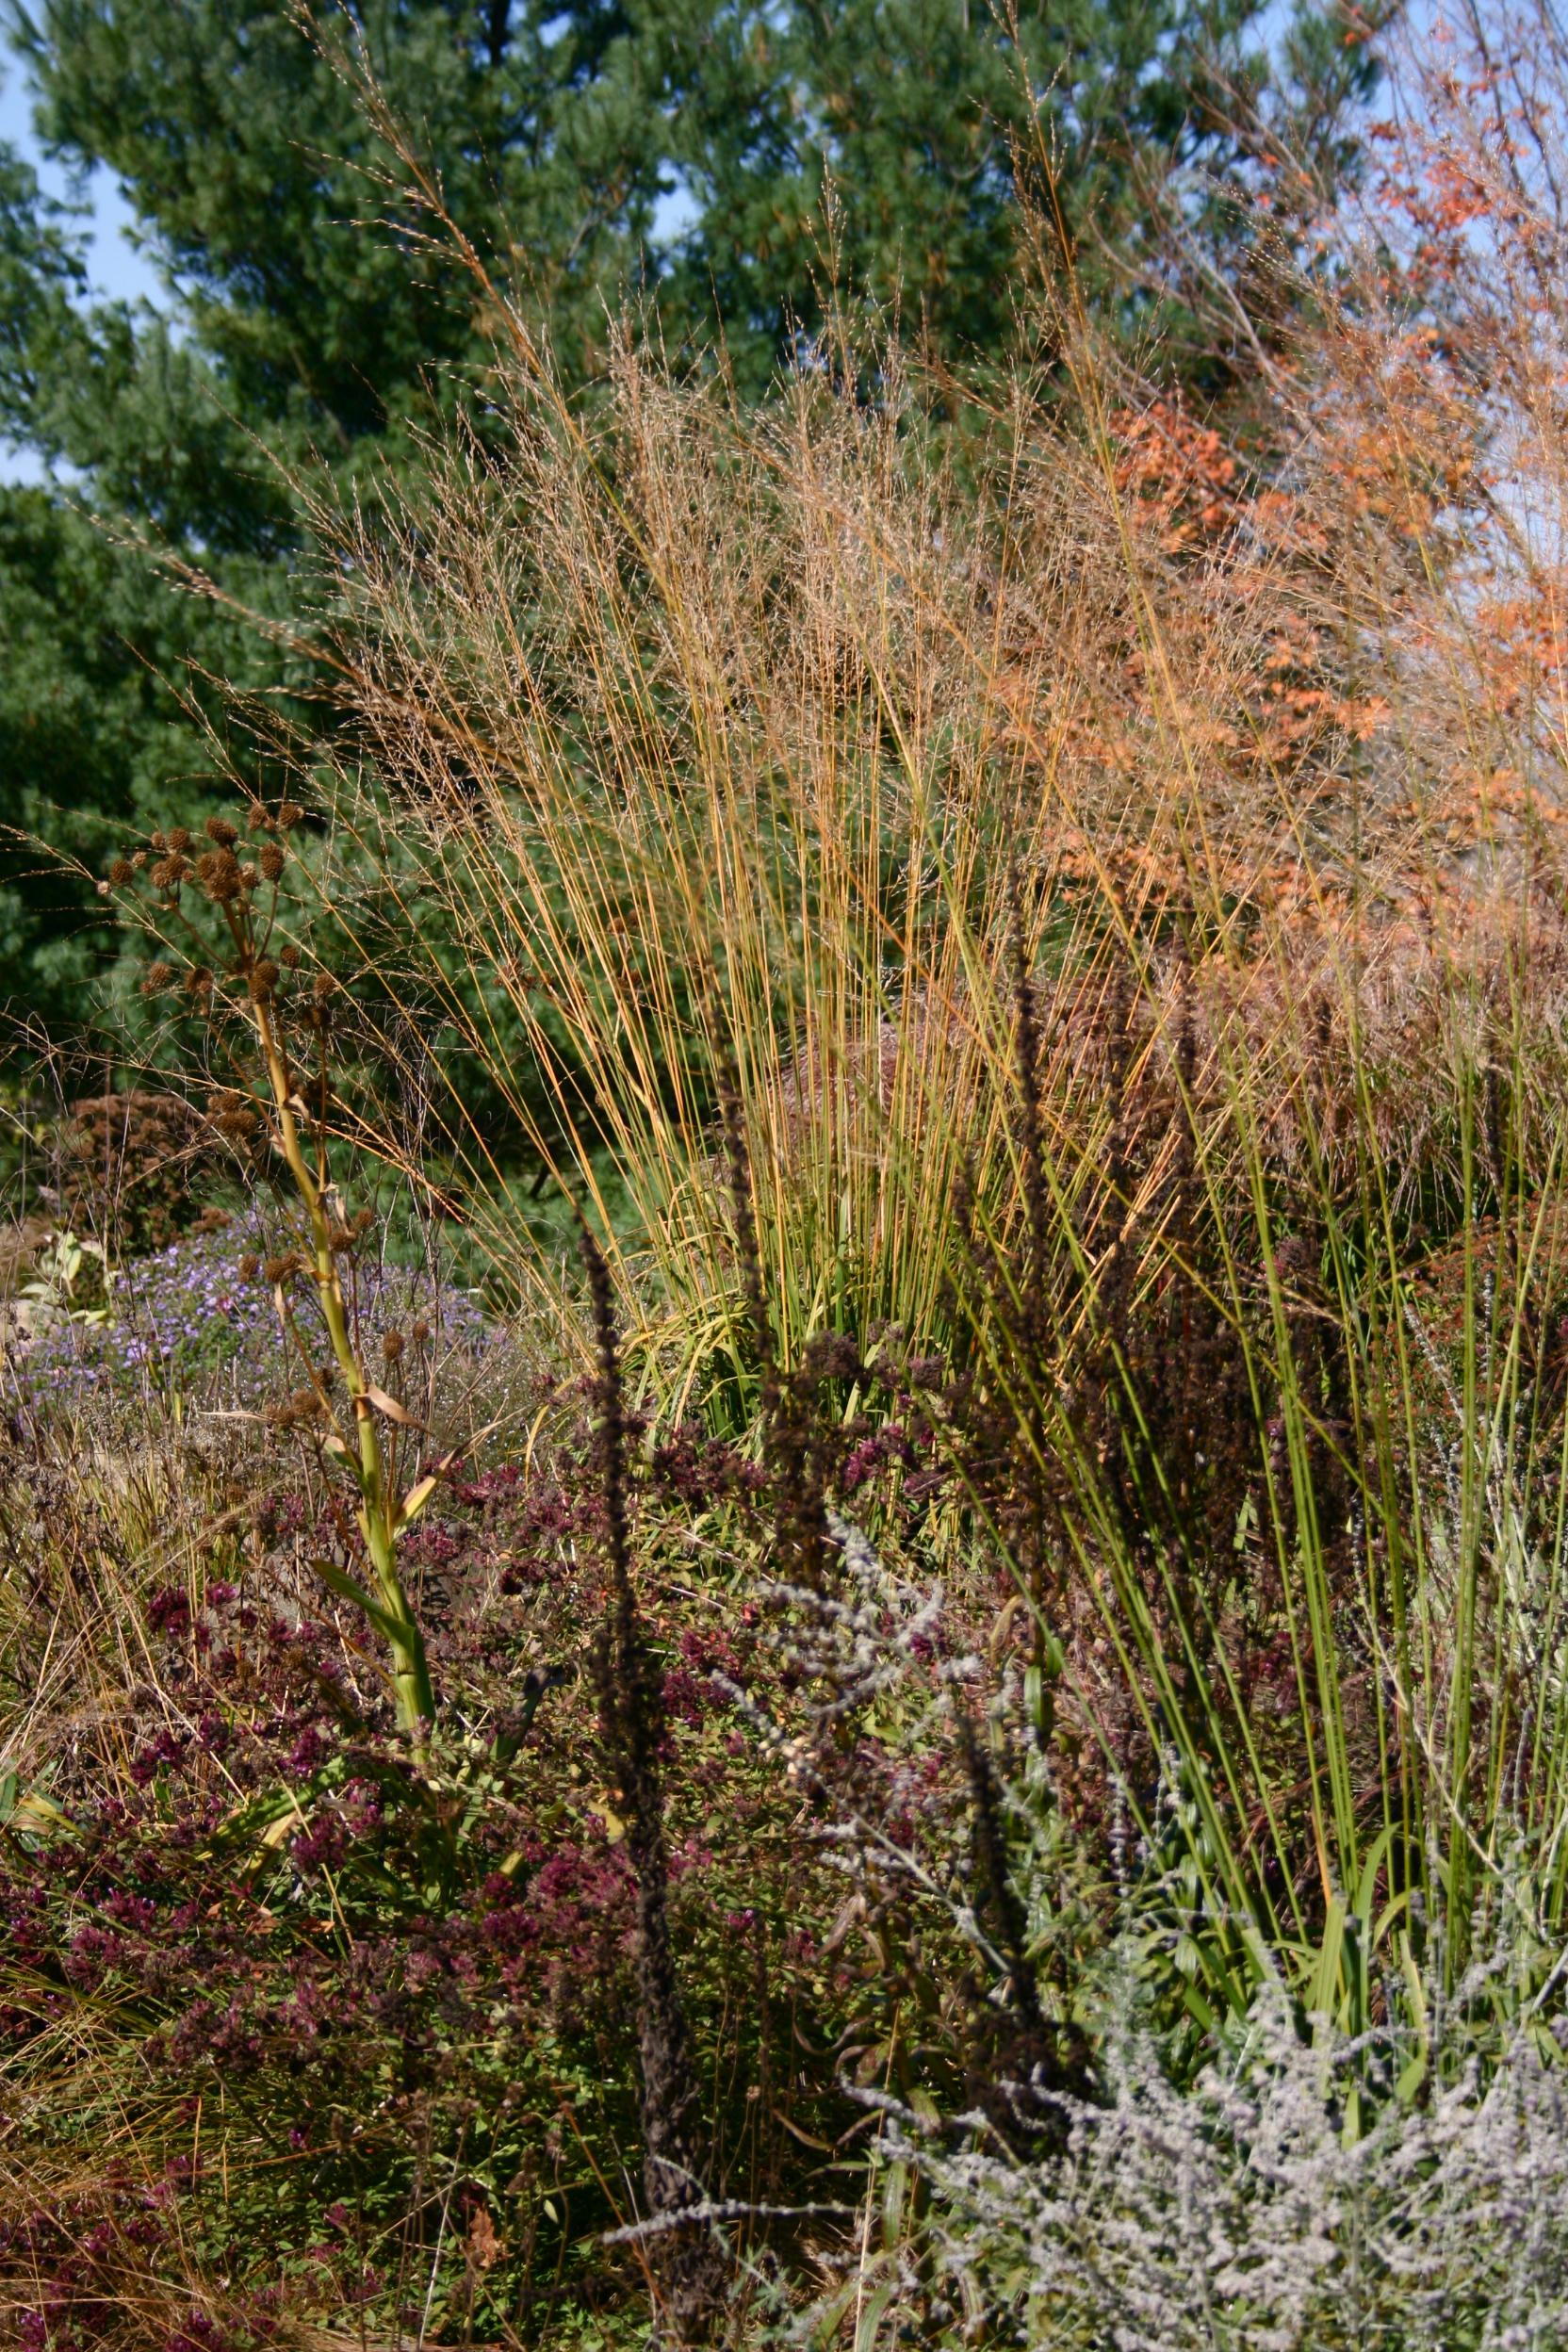 Ornamental grasses for fall plantstudios for Different ornamental grasses